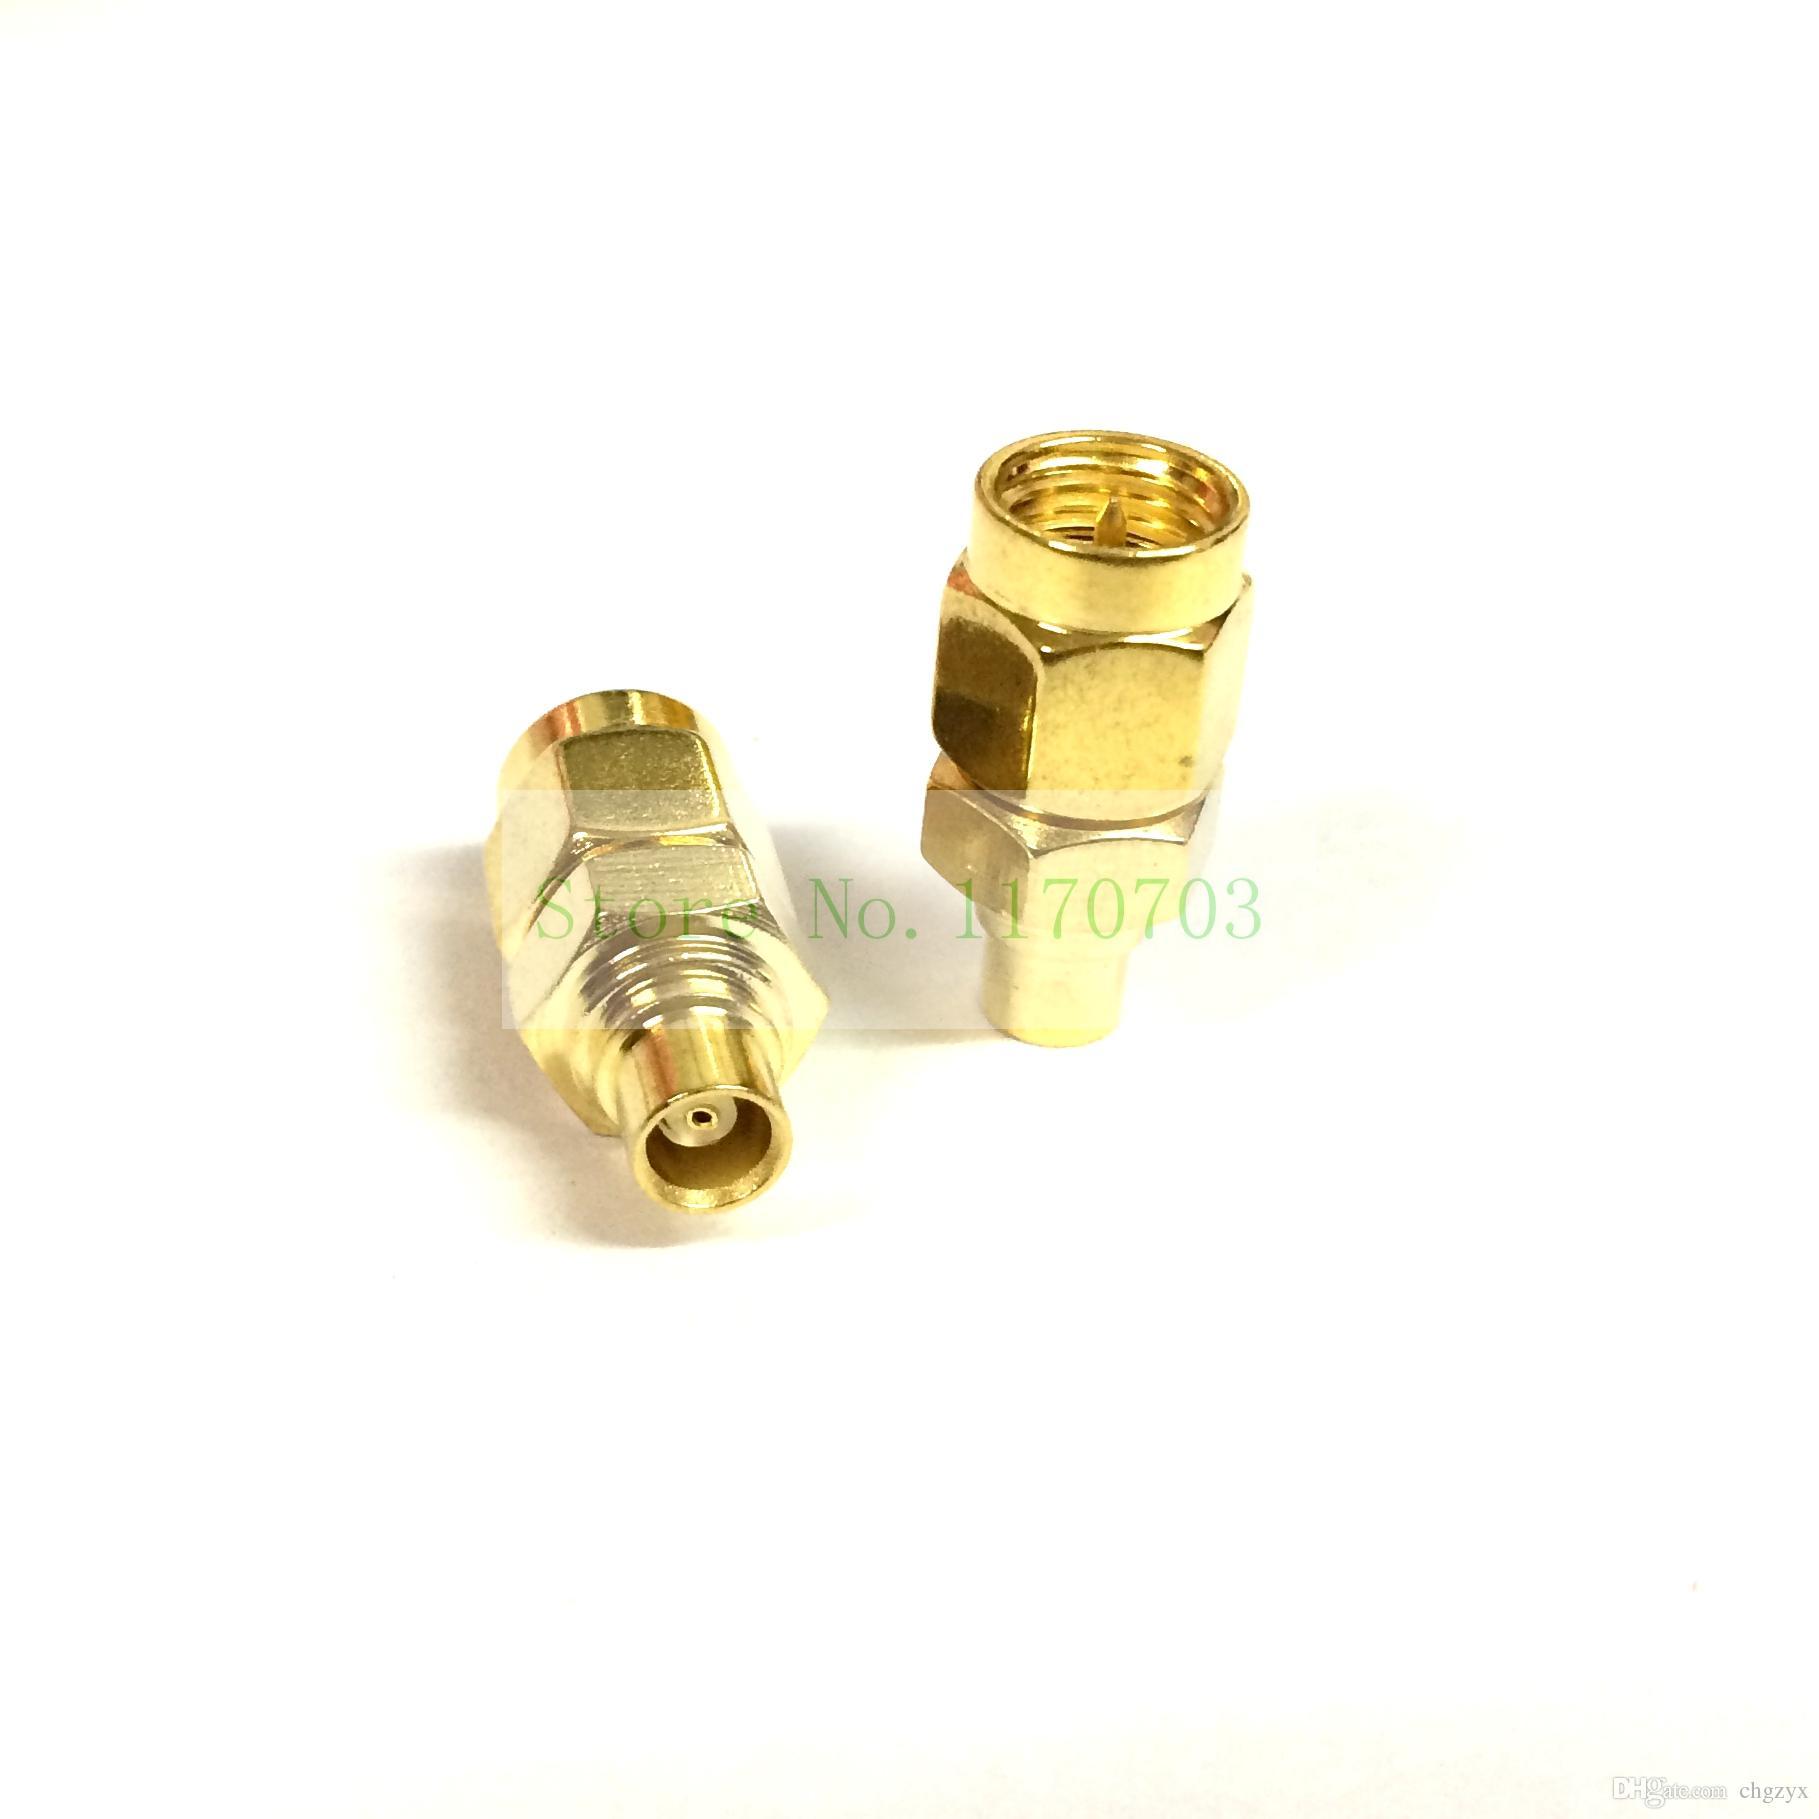 50 piezas Coaxial Goldmated SMA macho a conector hembra MCX Plug